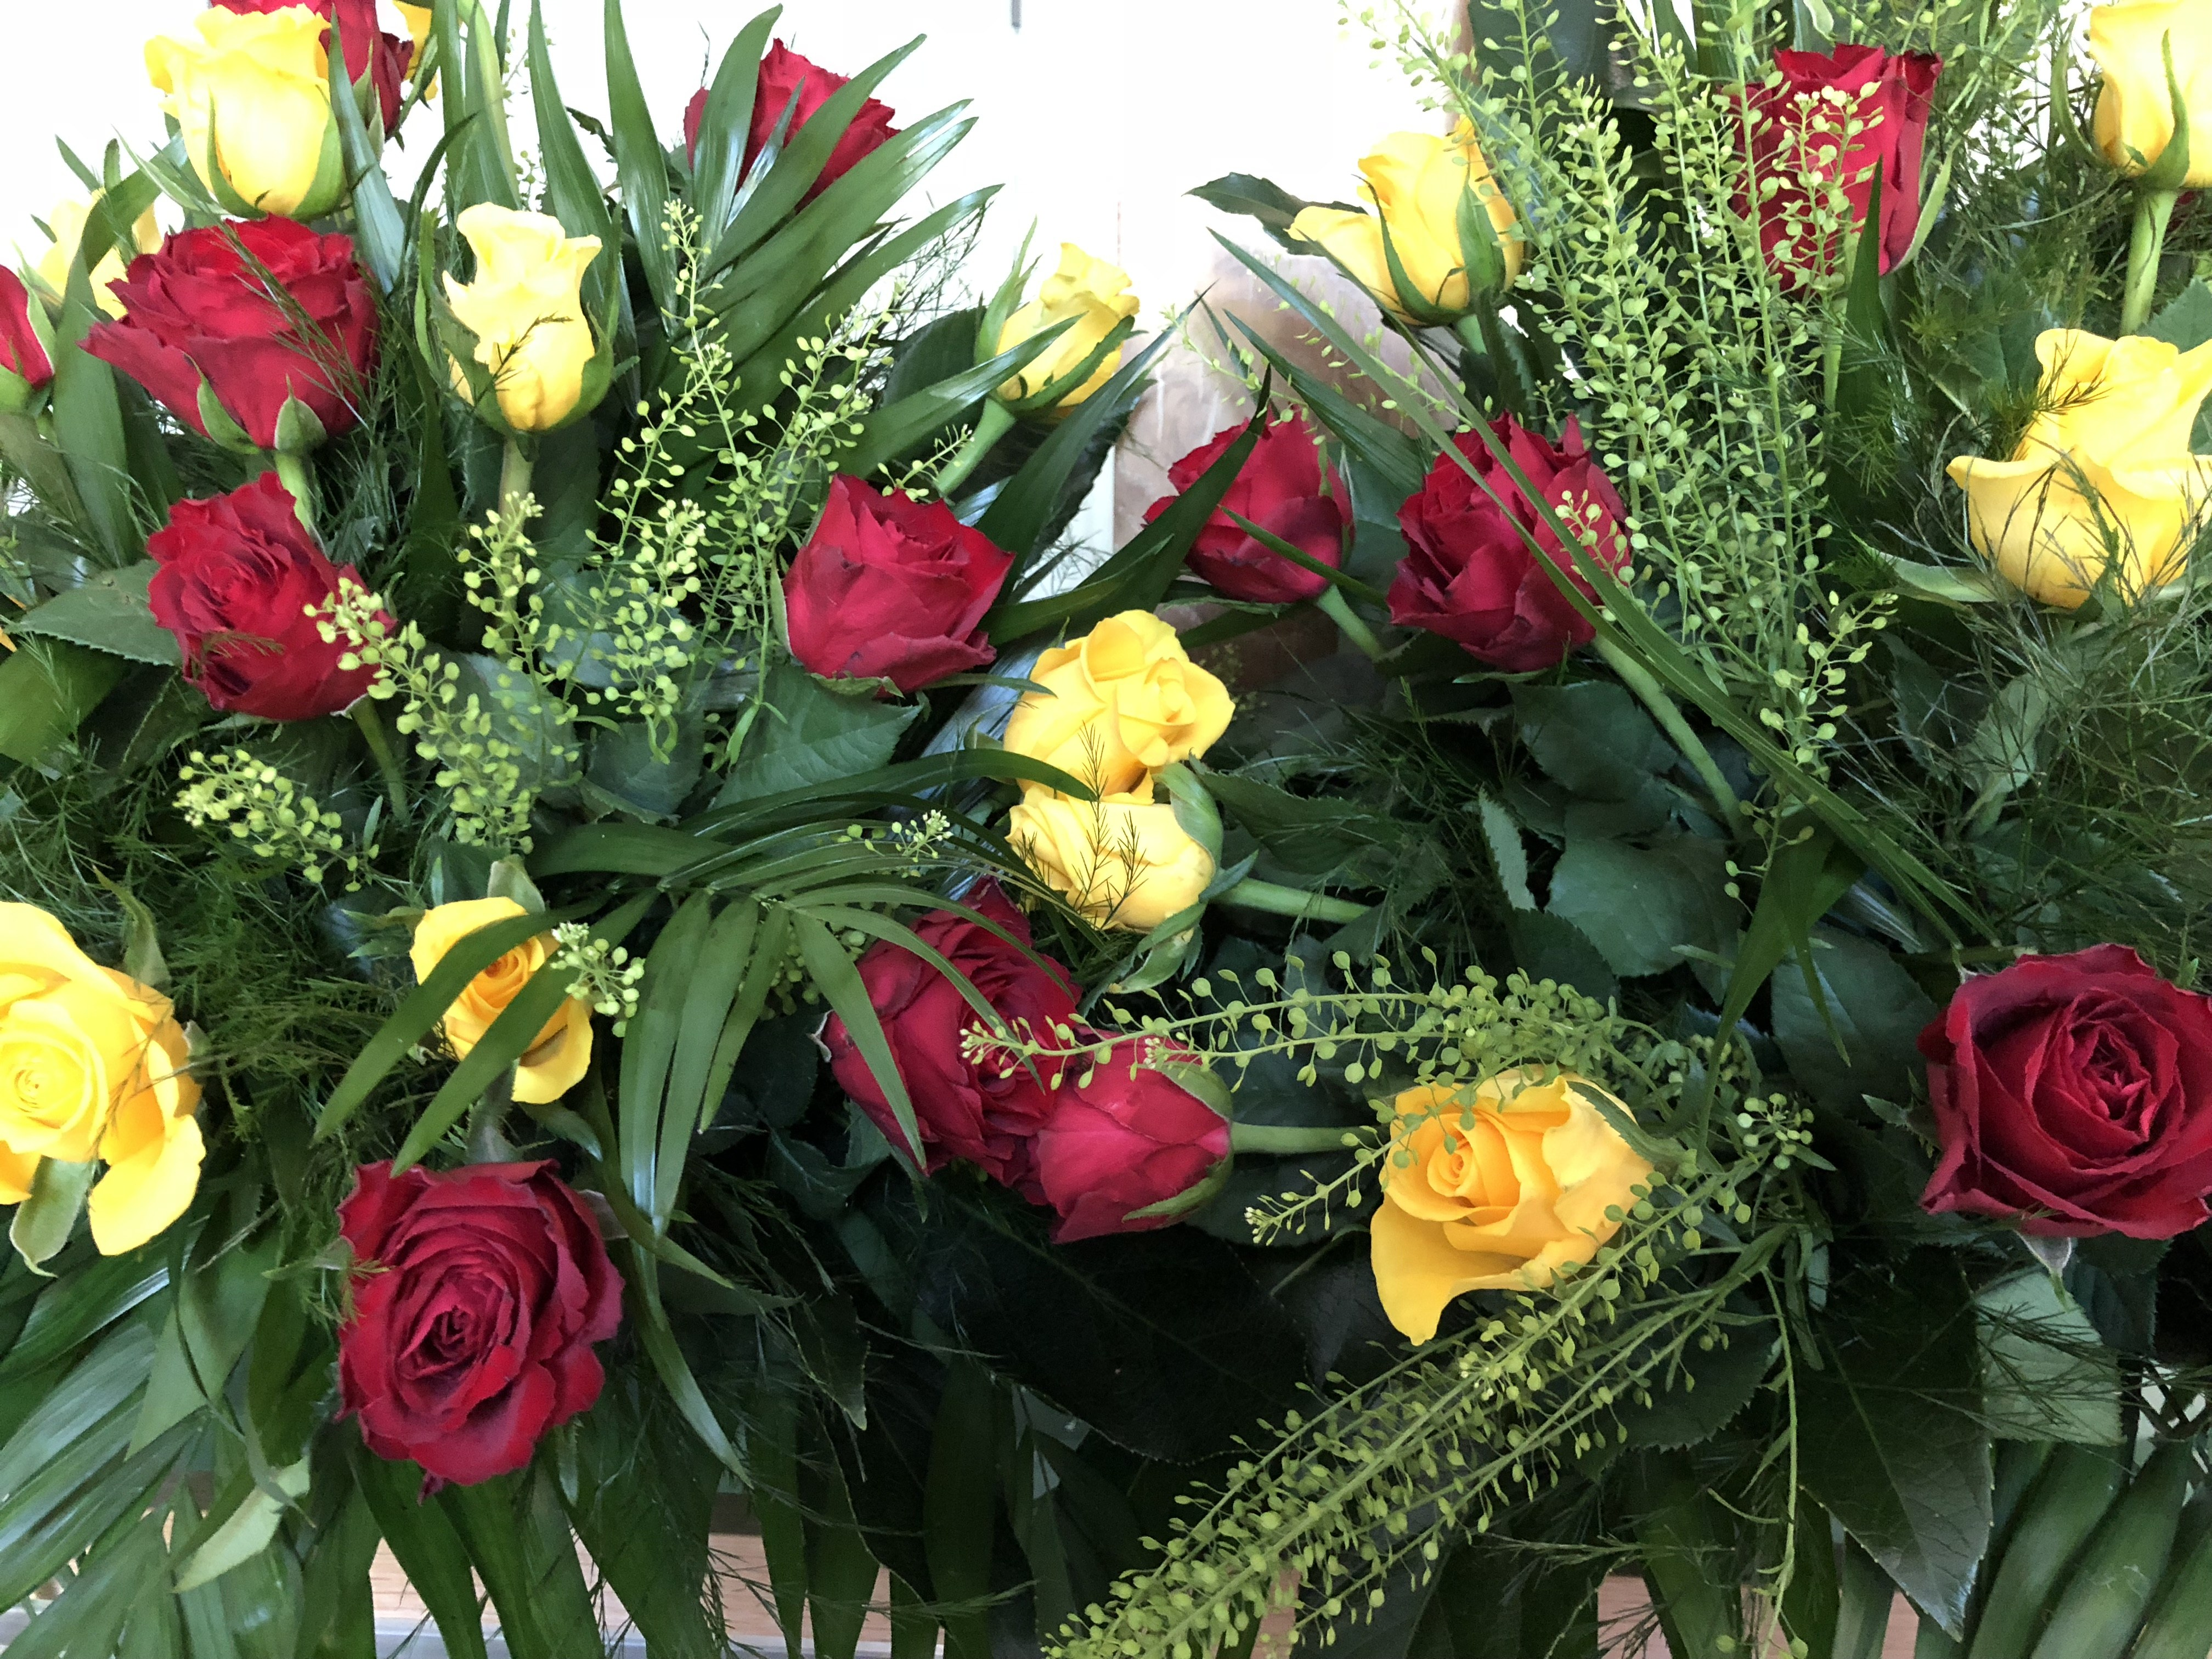 National day celebrated at time of renewal embassy of ethiopia london jz flowers and aldi uk ireland izmirmasajfo